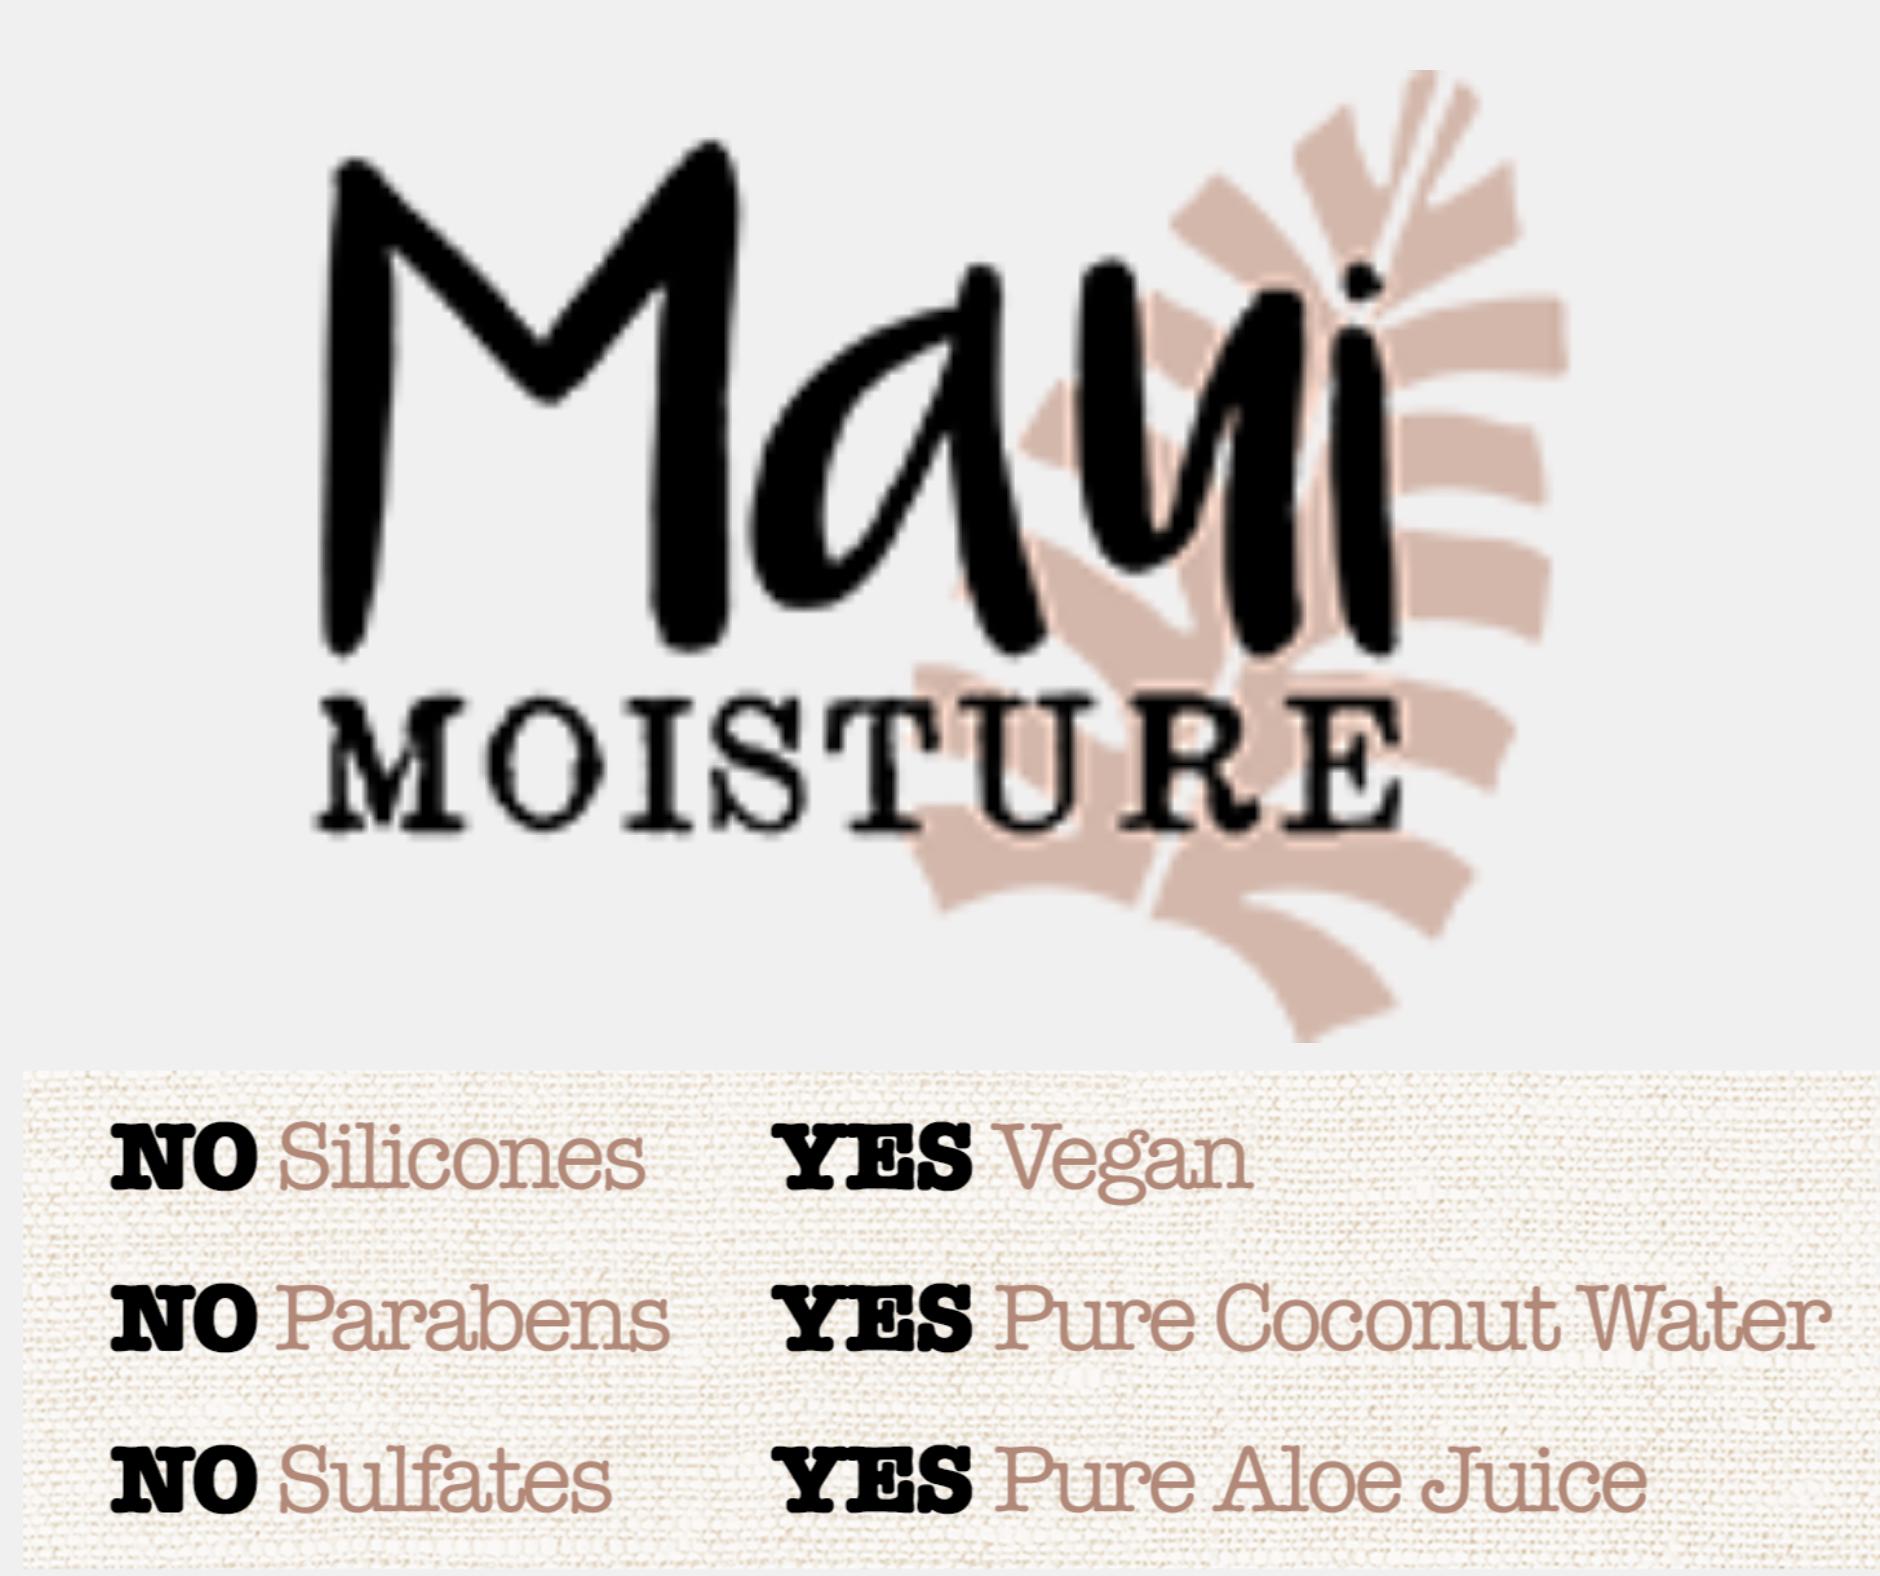 Maui moisture ماوي مويستشر